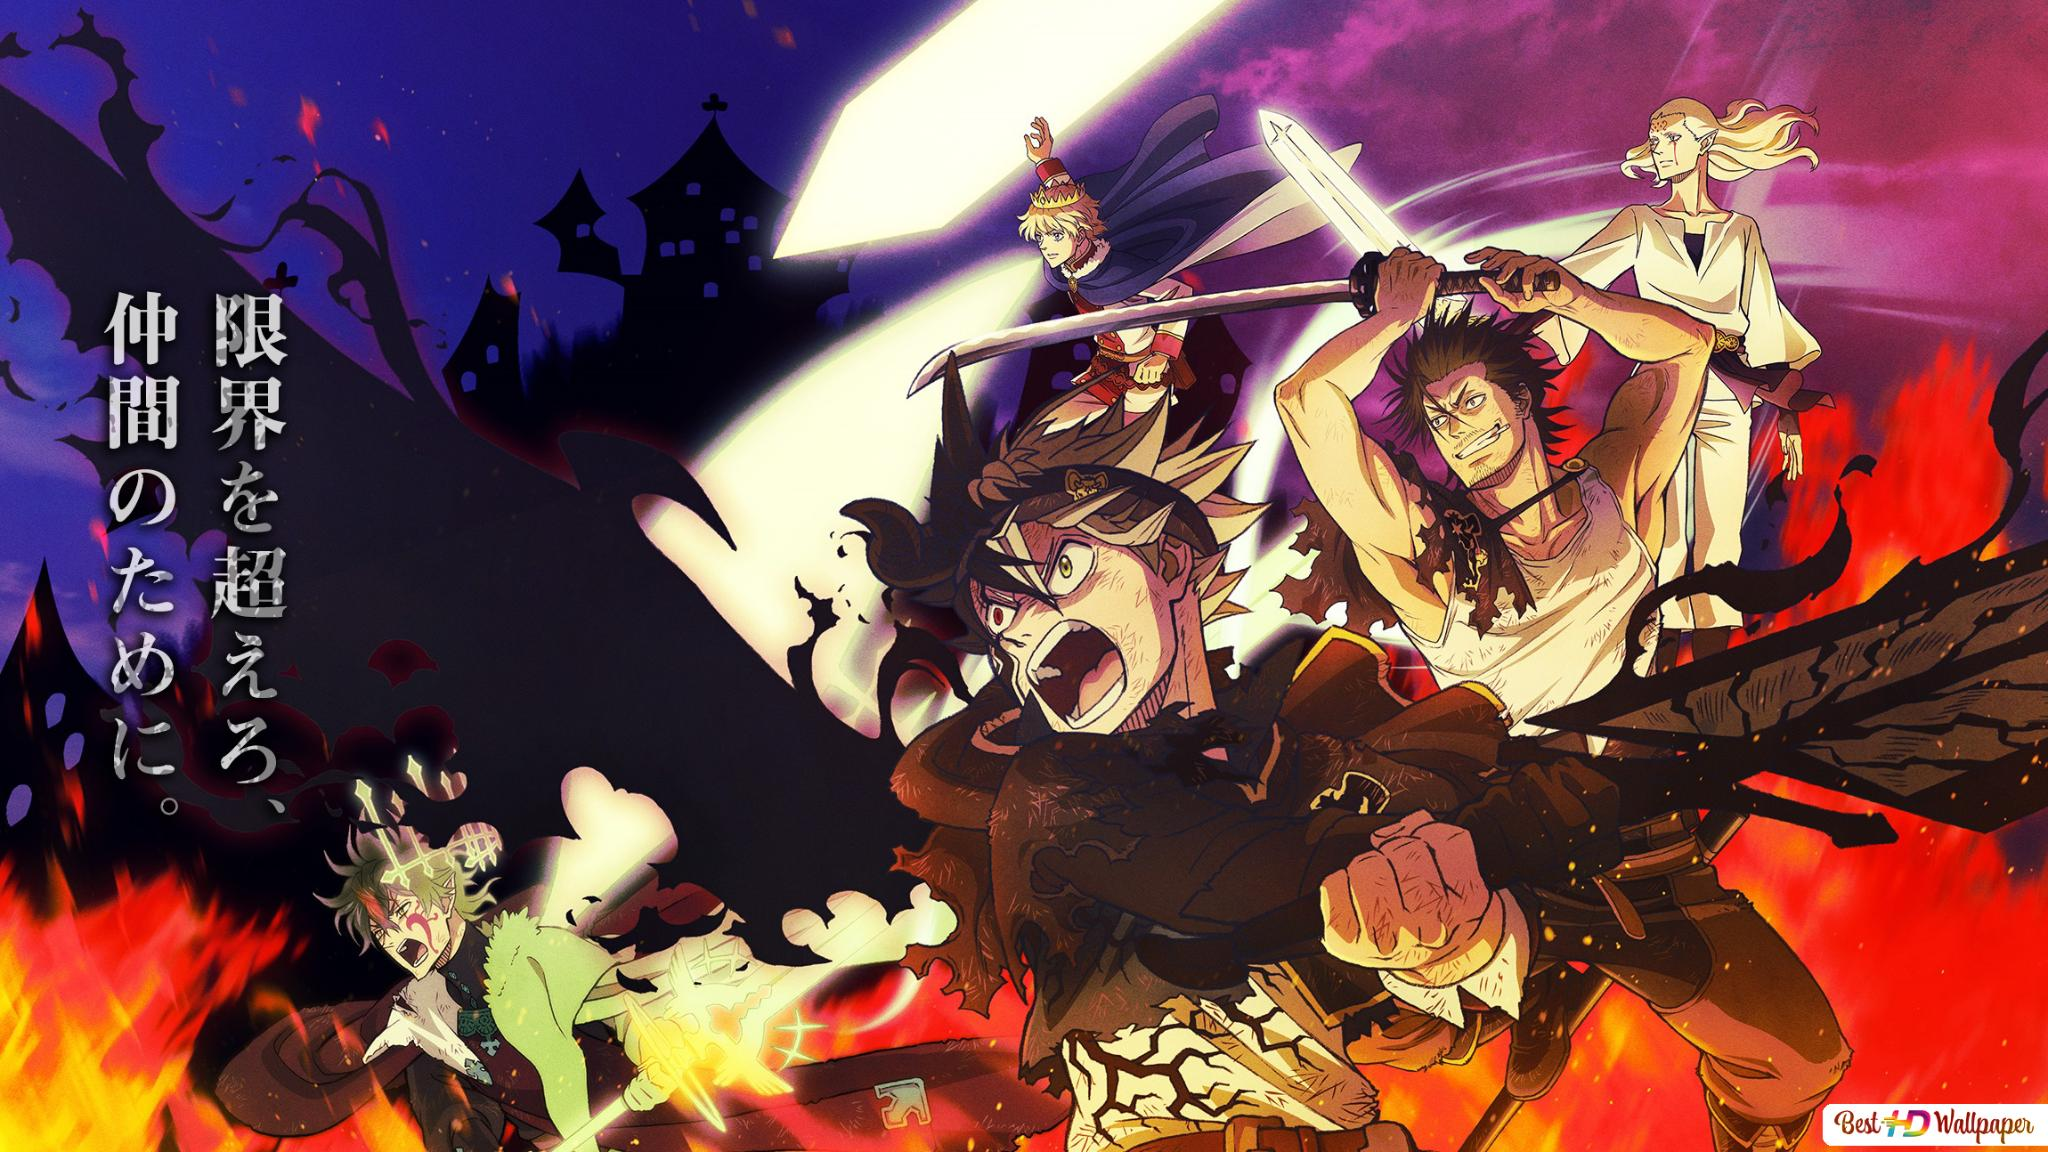 Anime Wallpaper Hd Wallpaper Black Clover